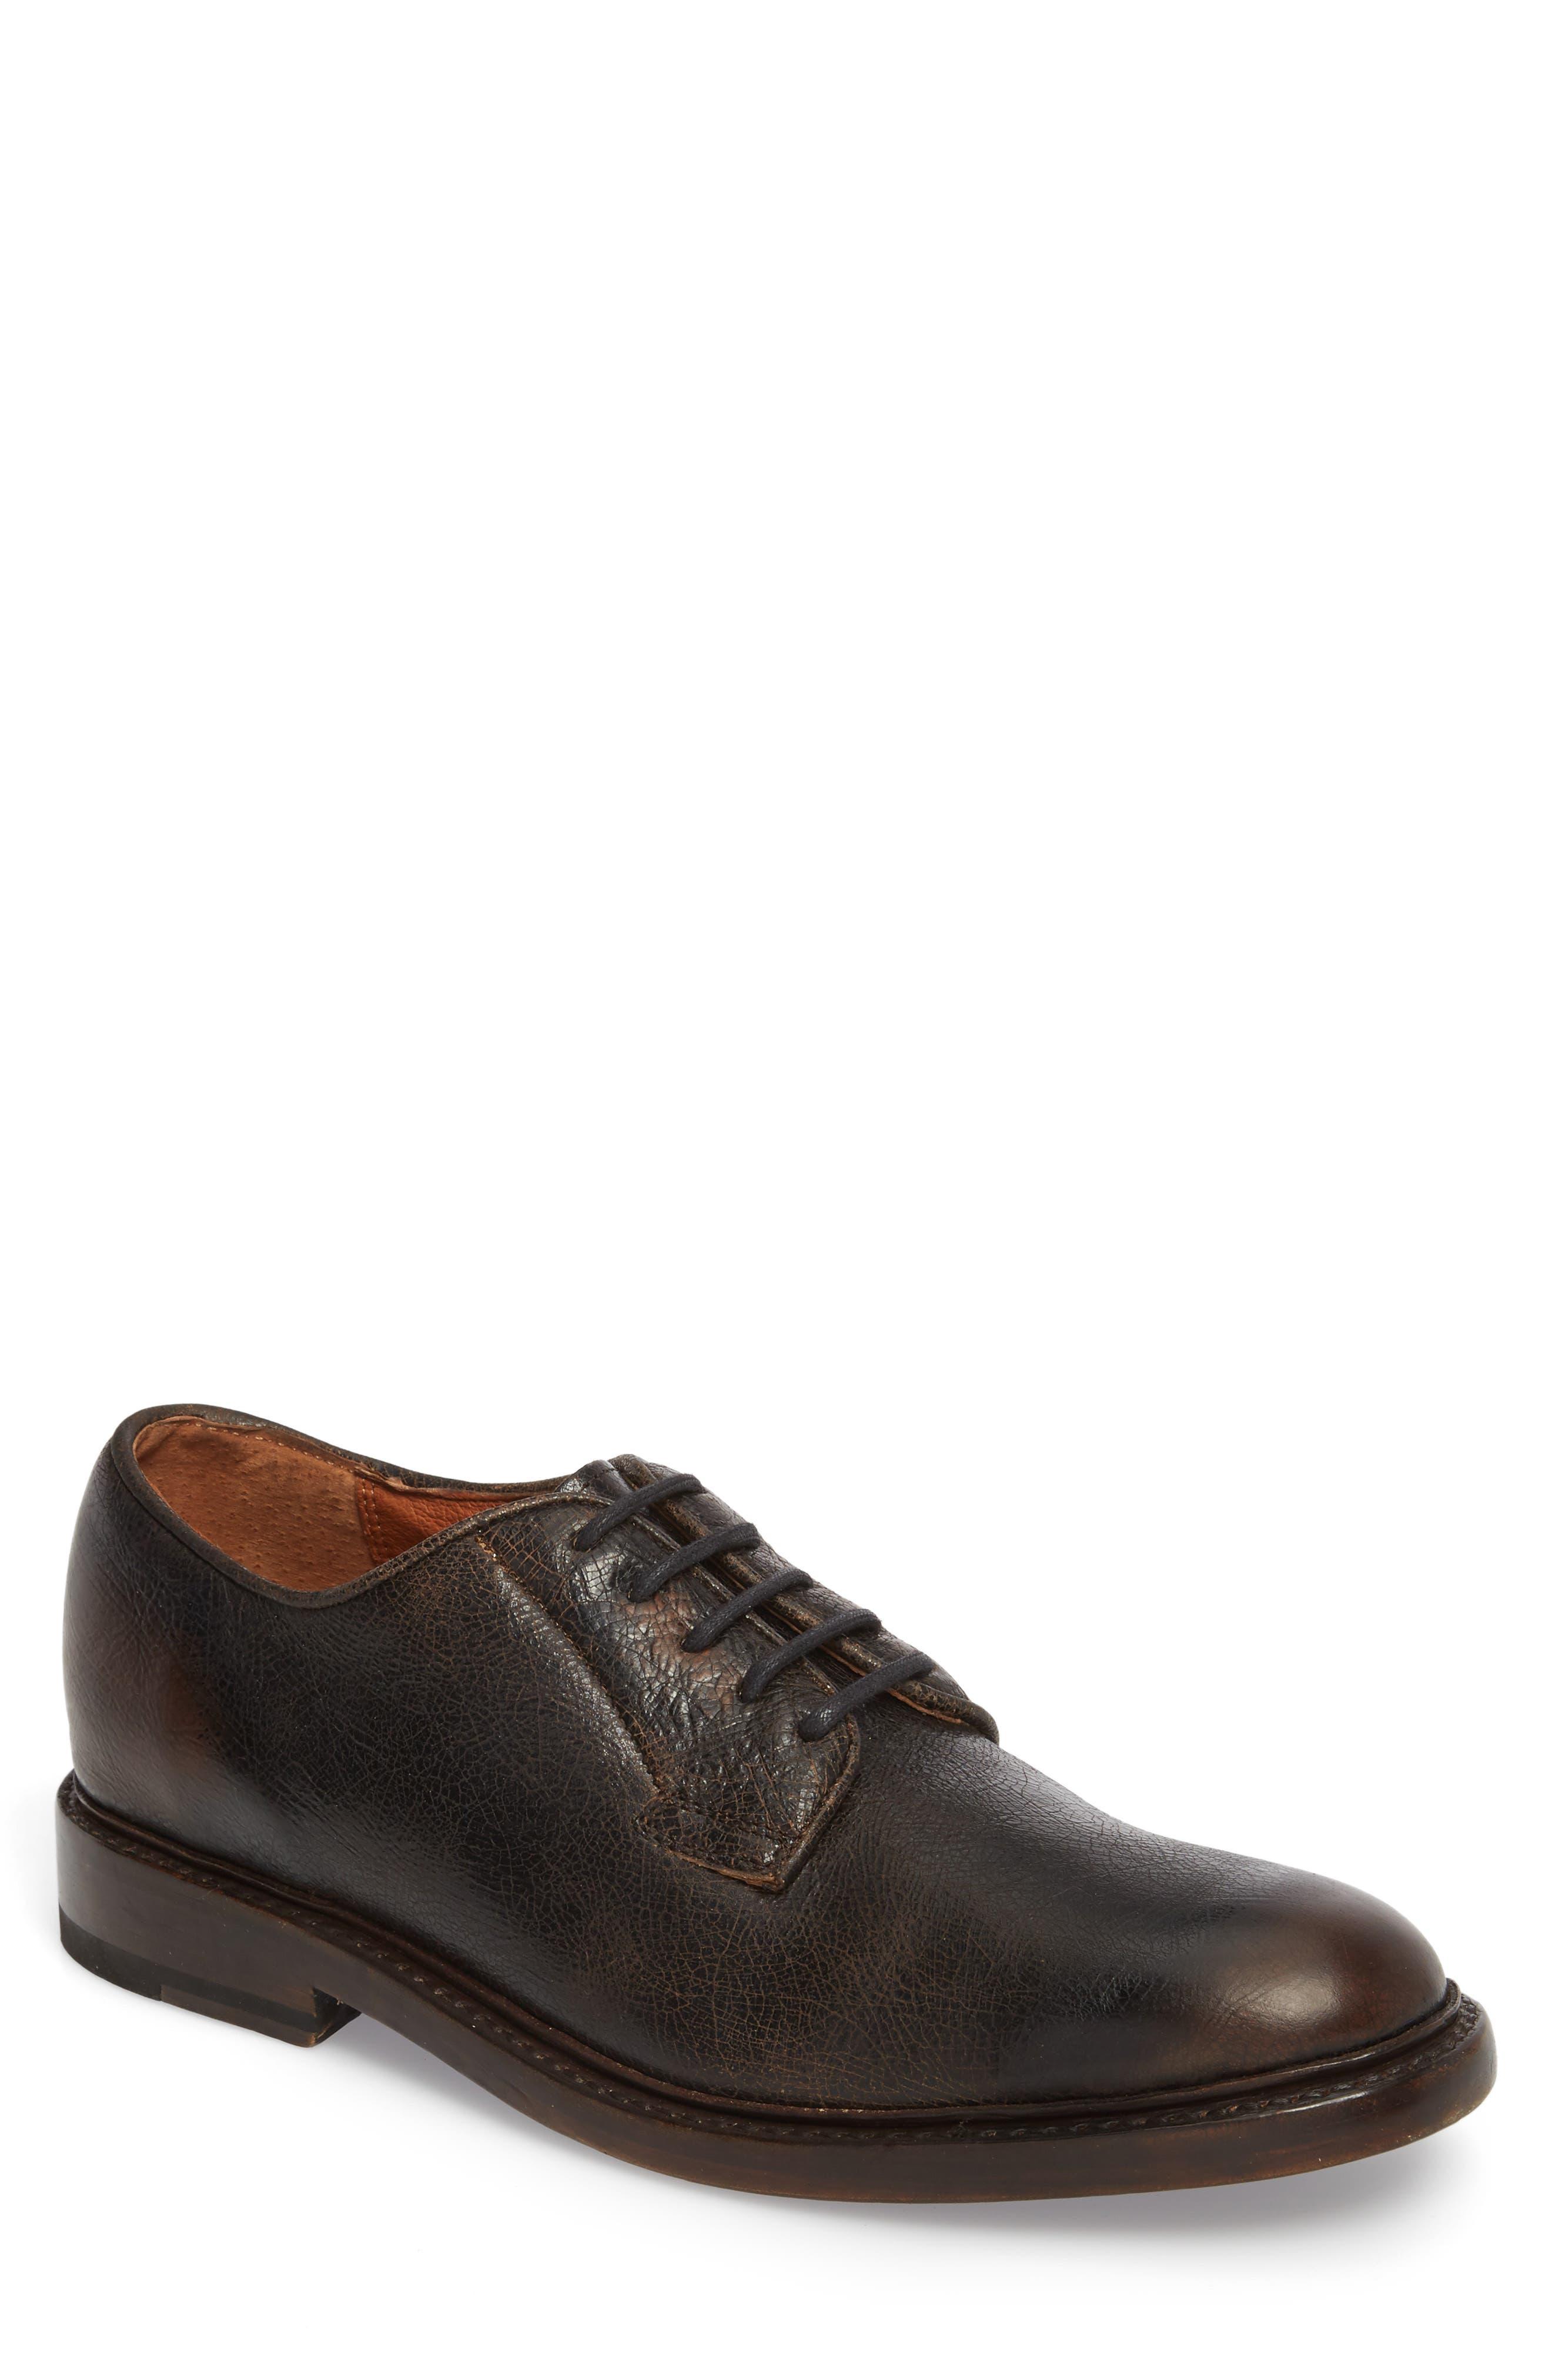 Jones Plain Toe Derby,                         Main,                         color, Dark Brown Leather